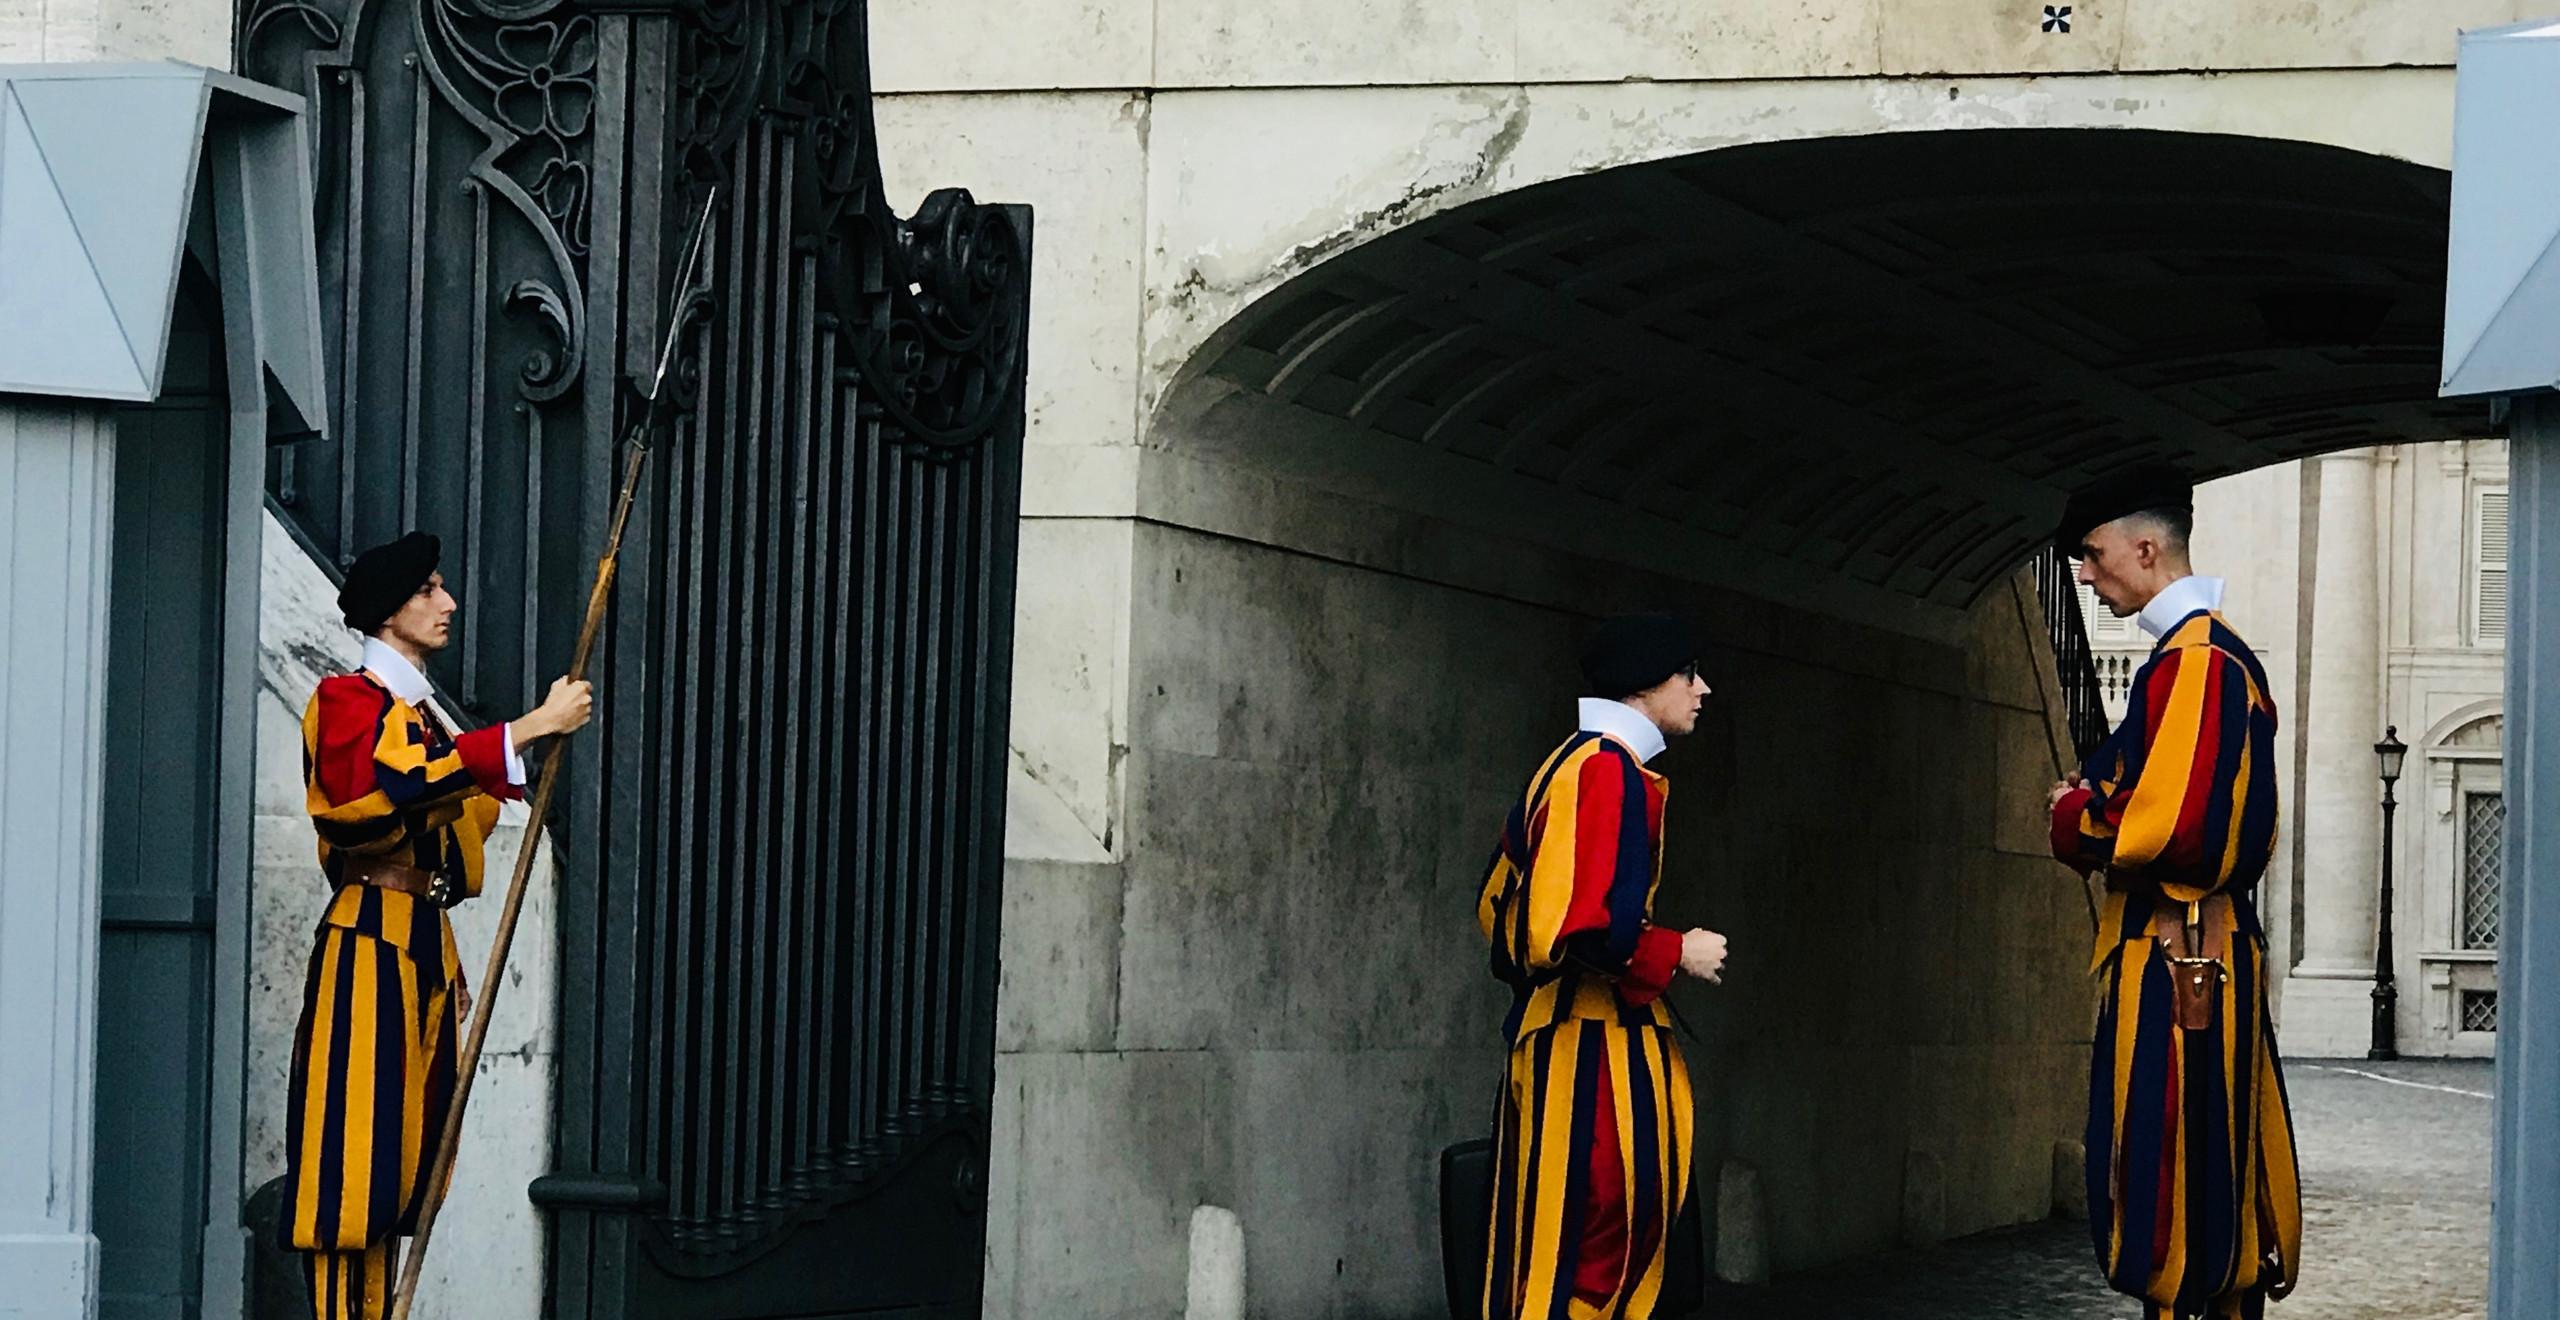 Swiss guards in Vatican City.